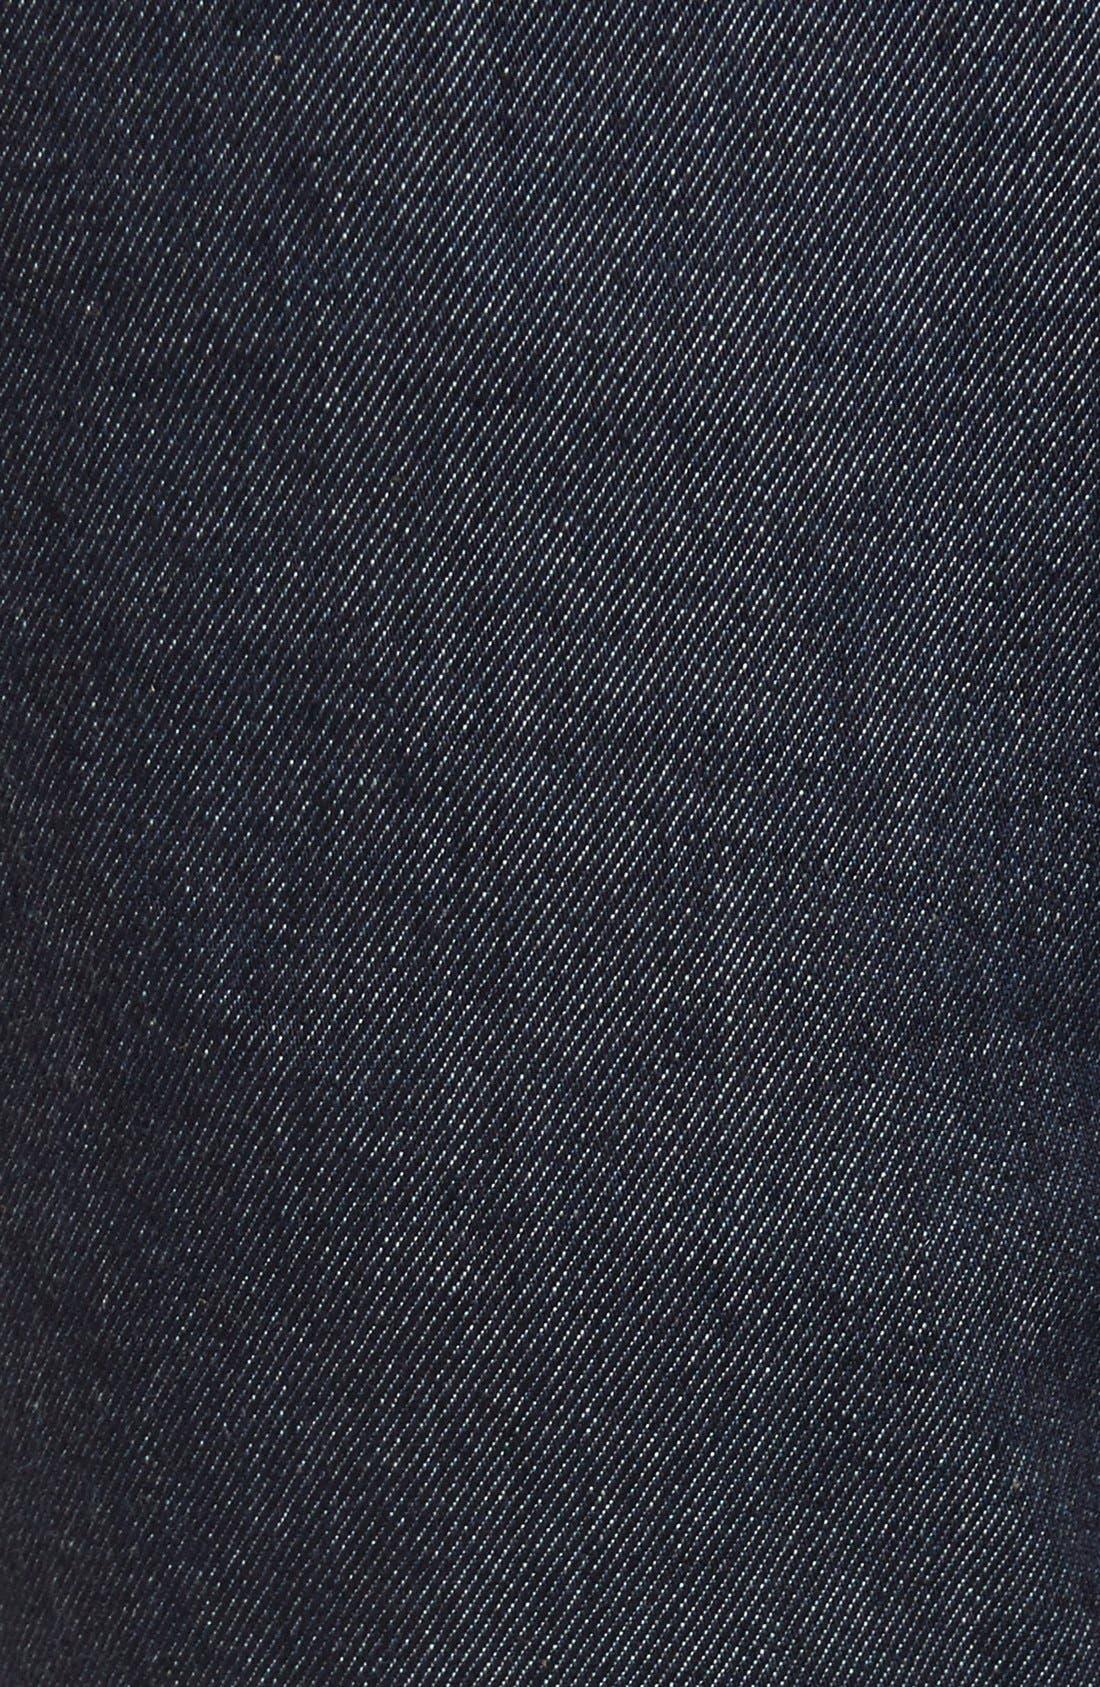 Vantage Skinny Fit Jeans,                             Alternate thumbnail 10, color,